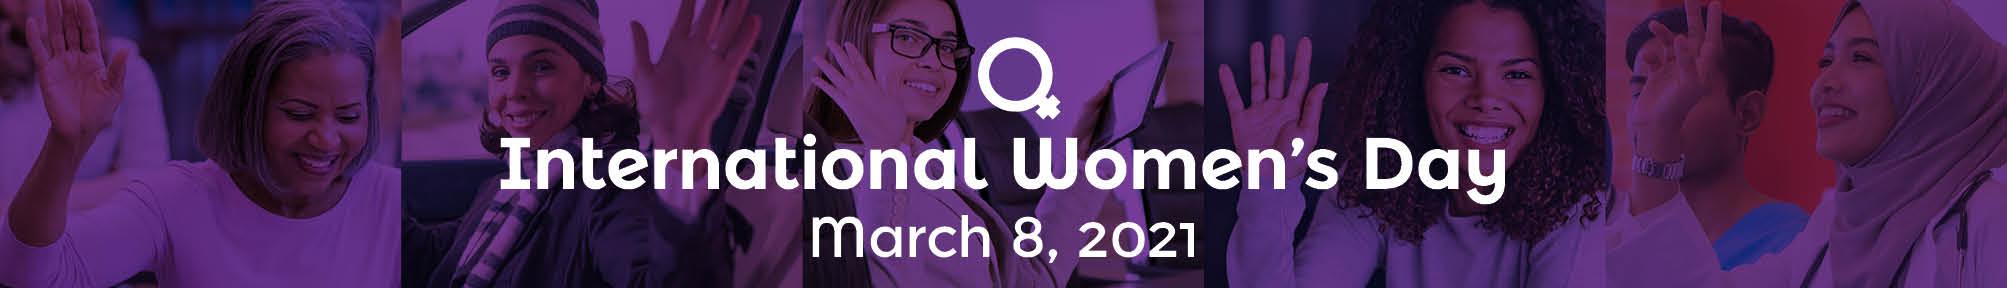 International Women's Day March 8, 2021